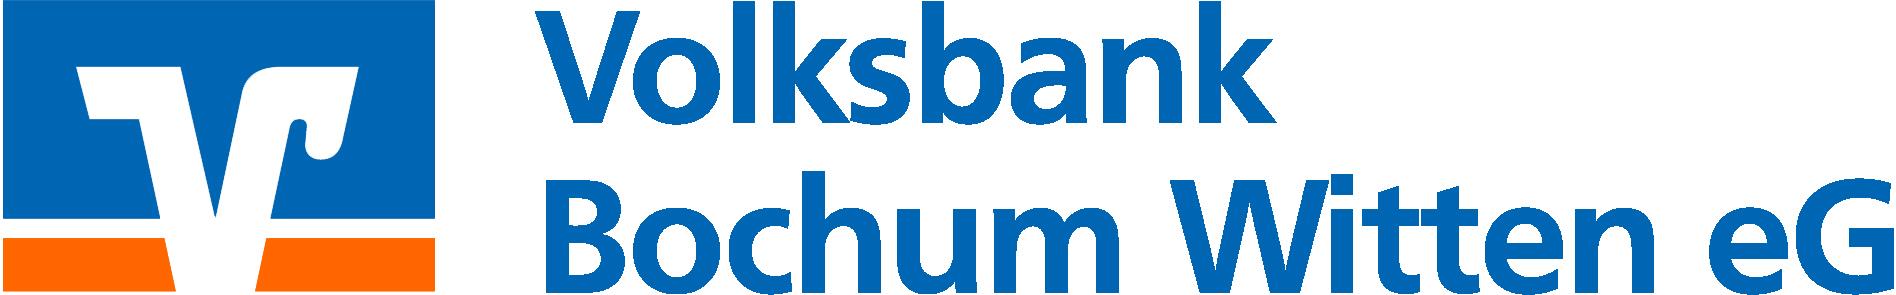 SB-Center Volksbank Bochum Witten eG